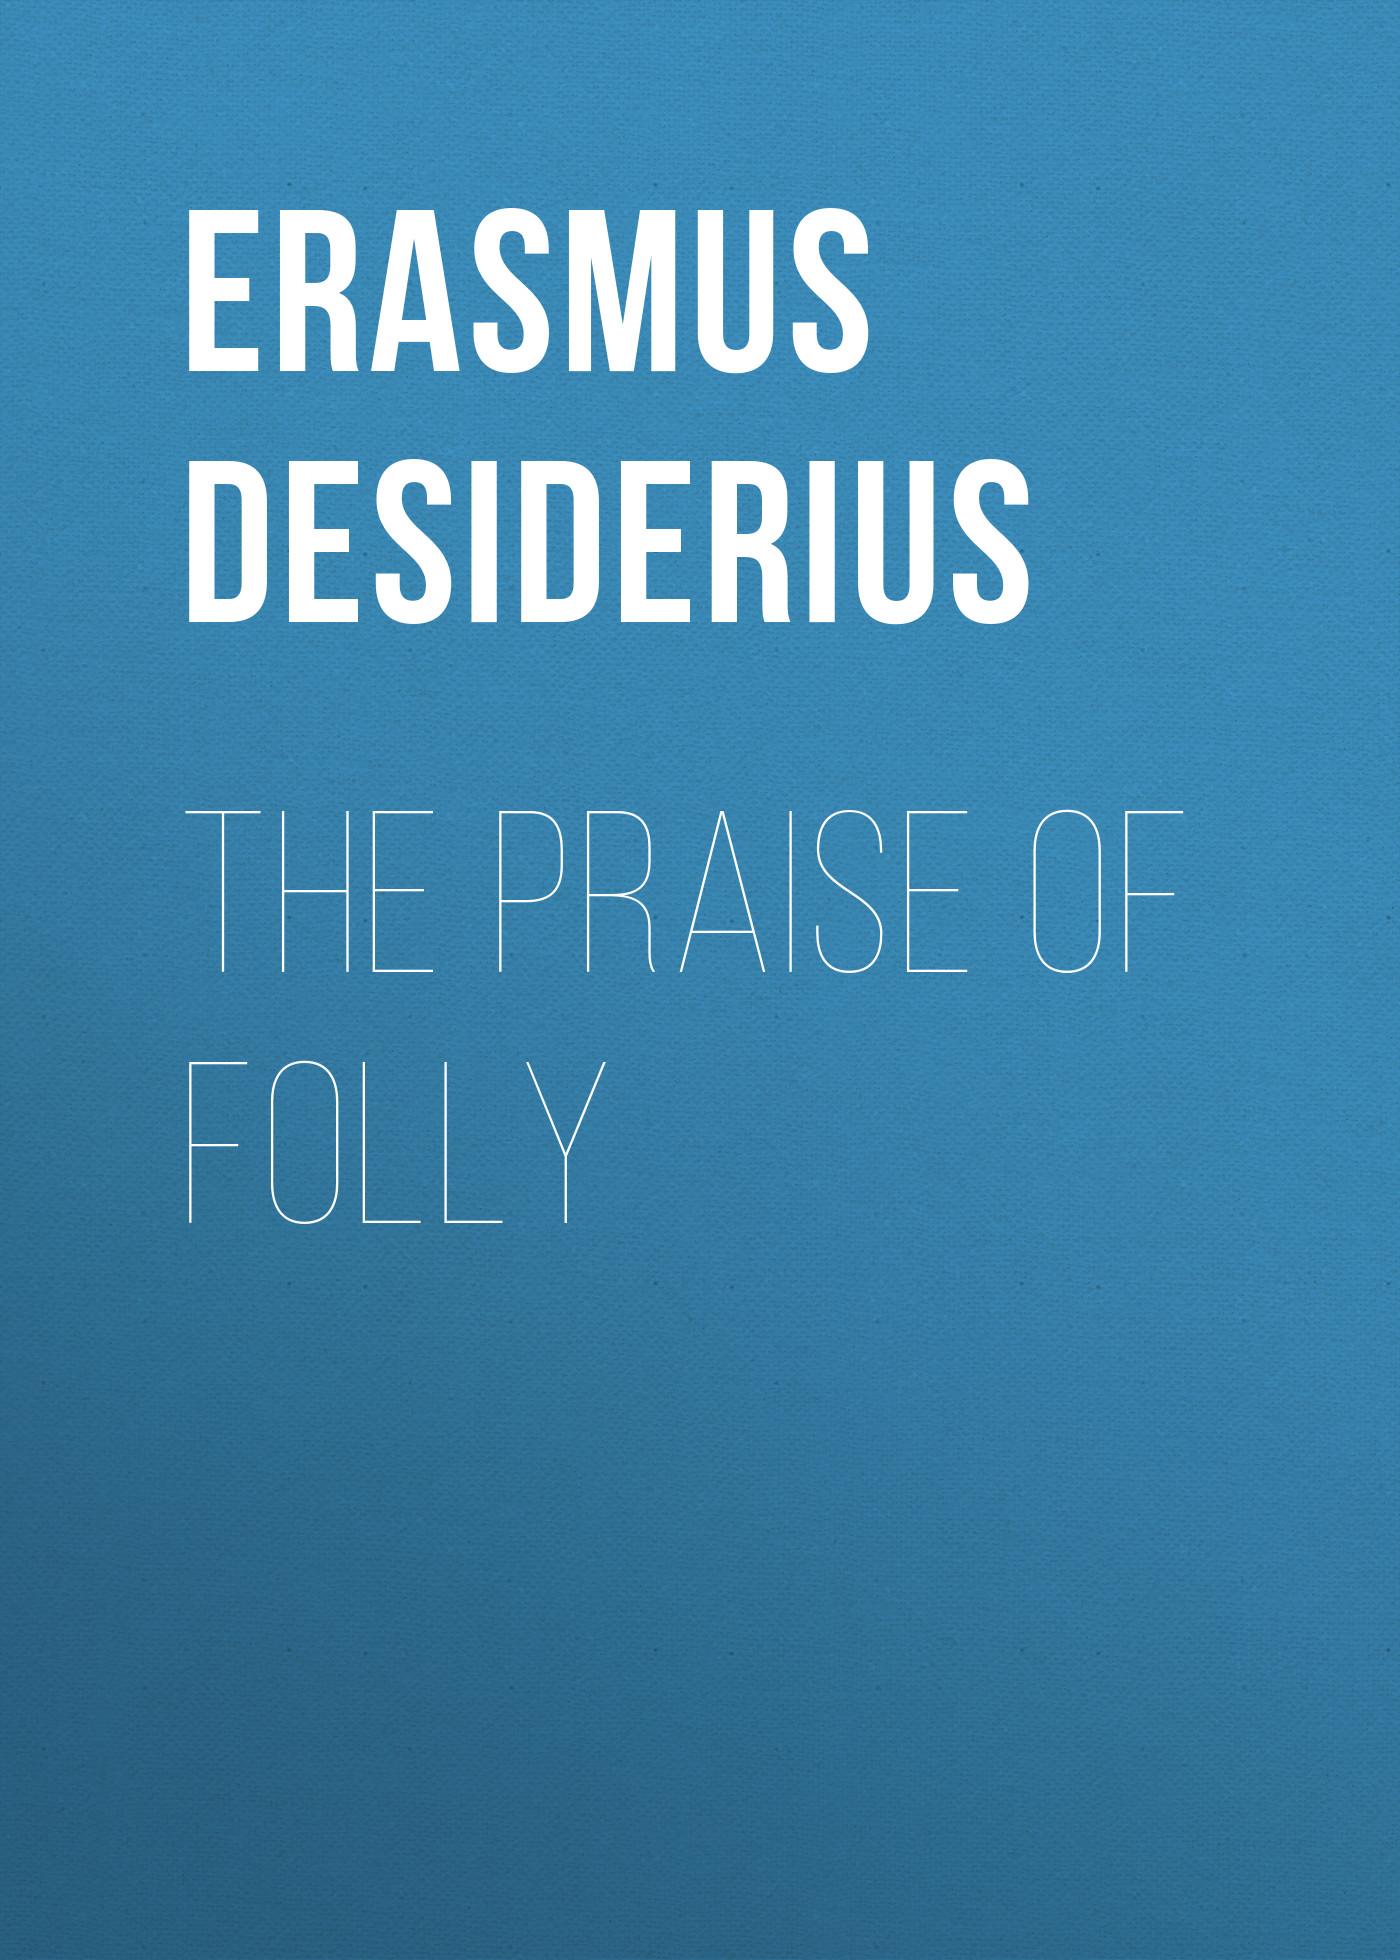 Erasmus Desiderius The Praise of Folly